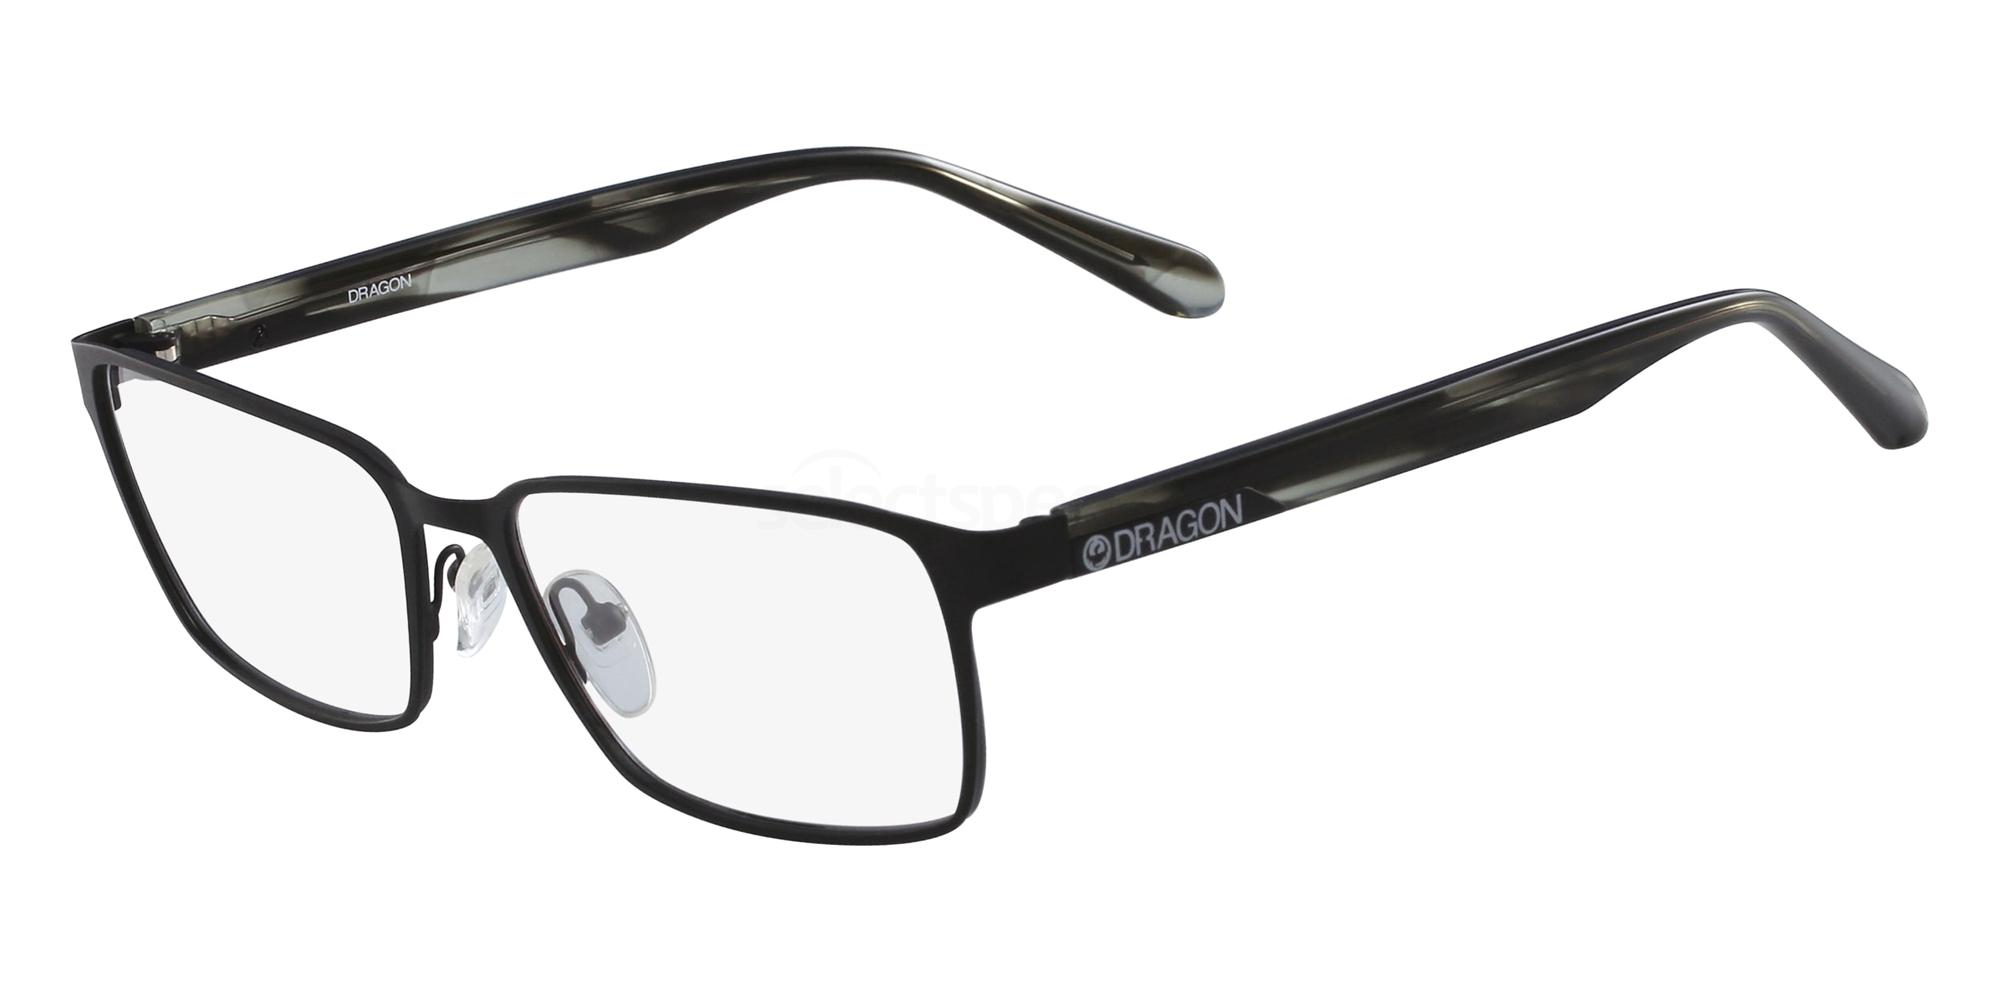 002 DR162 BENNY Glasses, Dragon